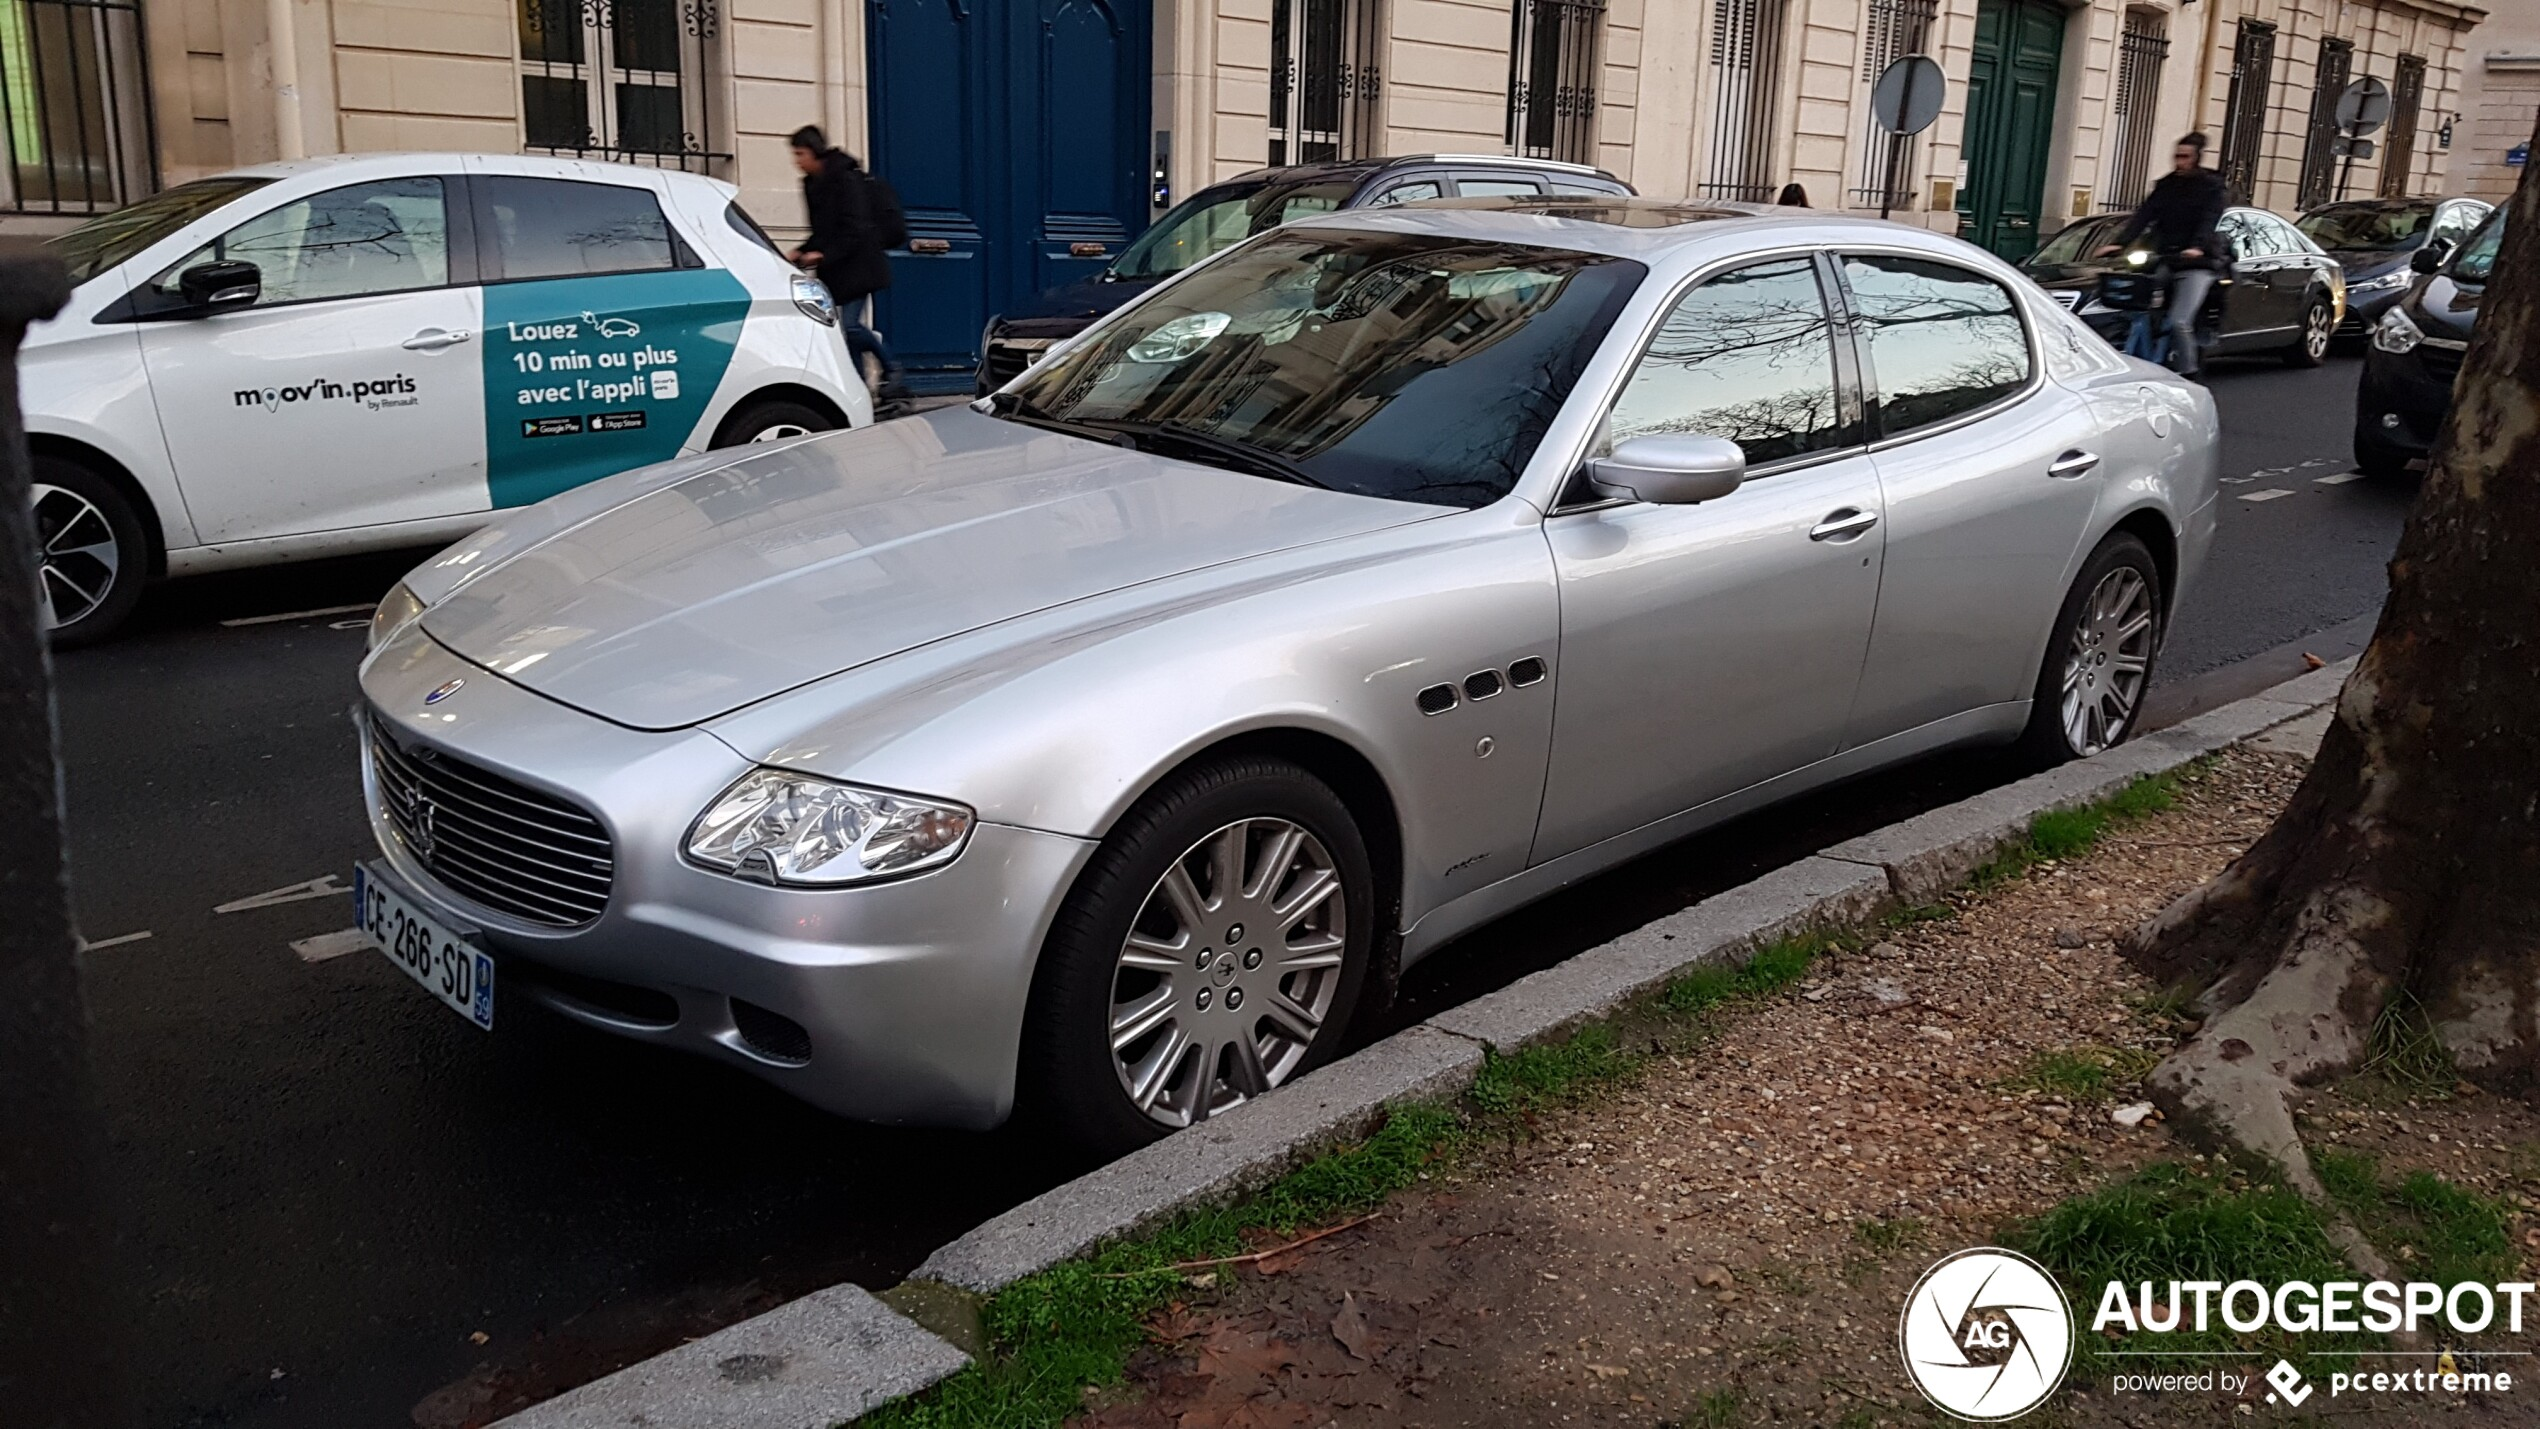 Maserati Quattroporte - 16 December 2019 - Autogespot